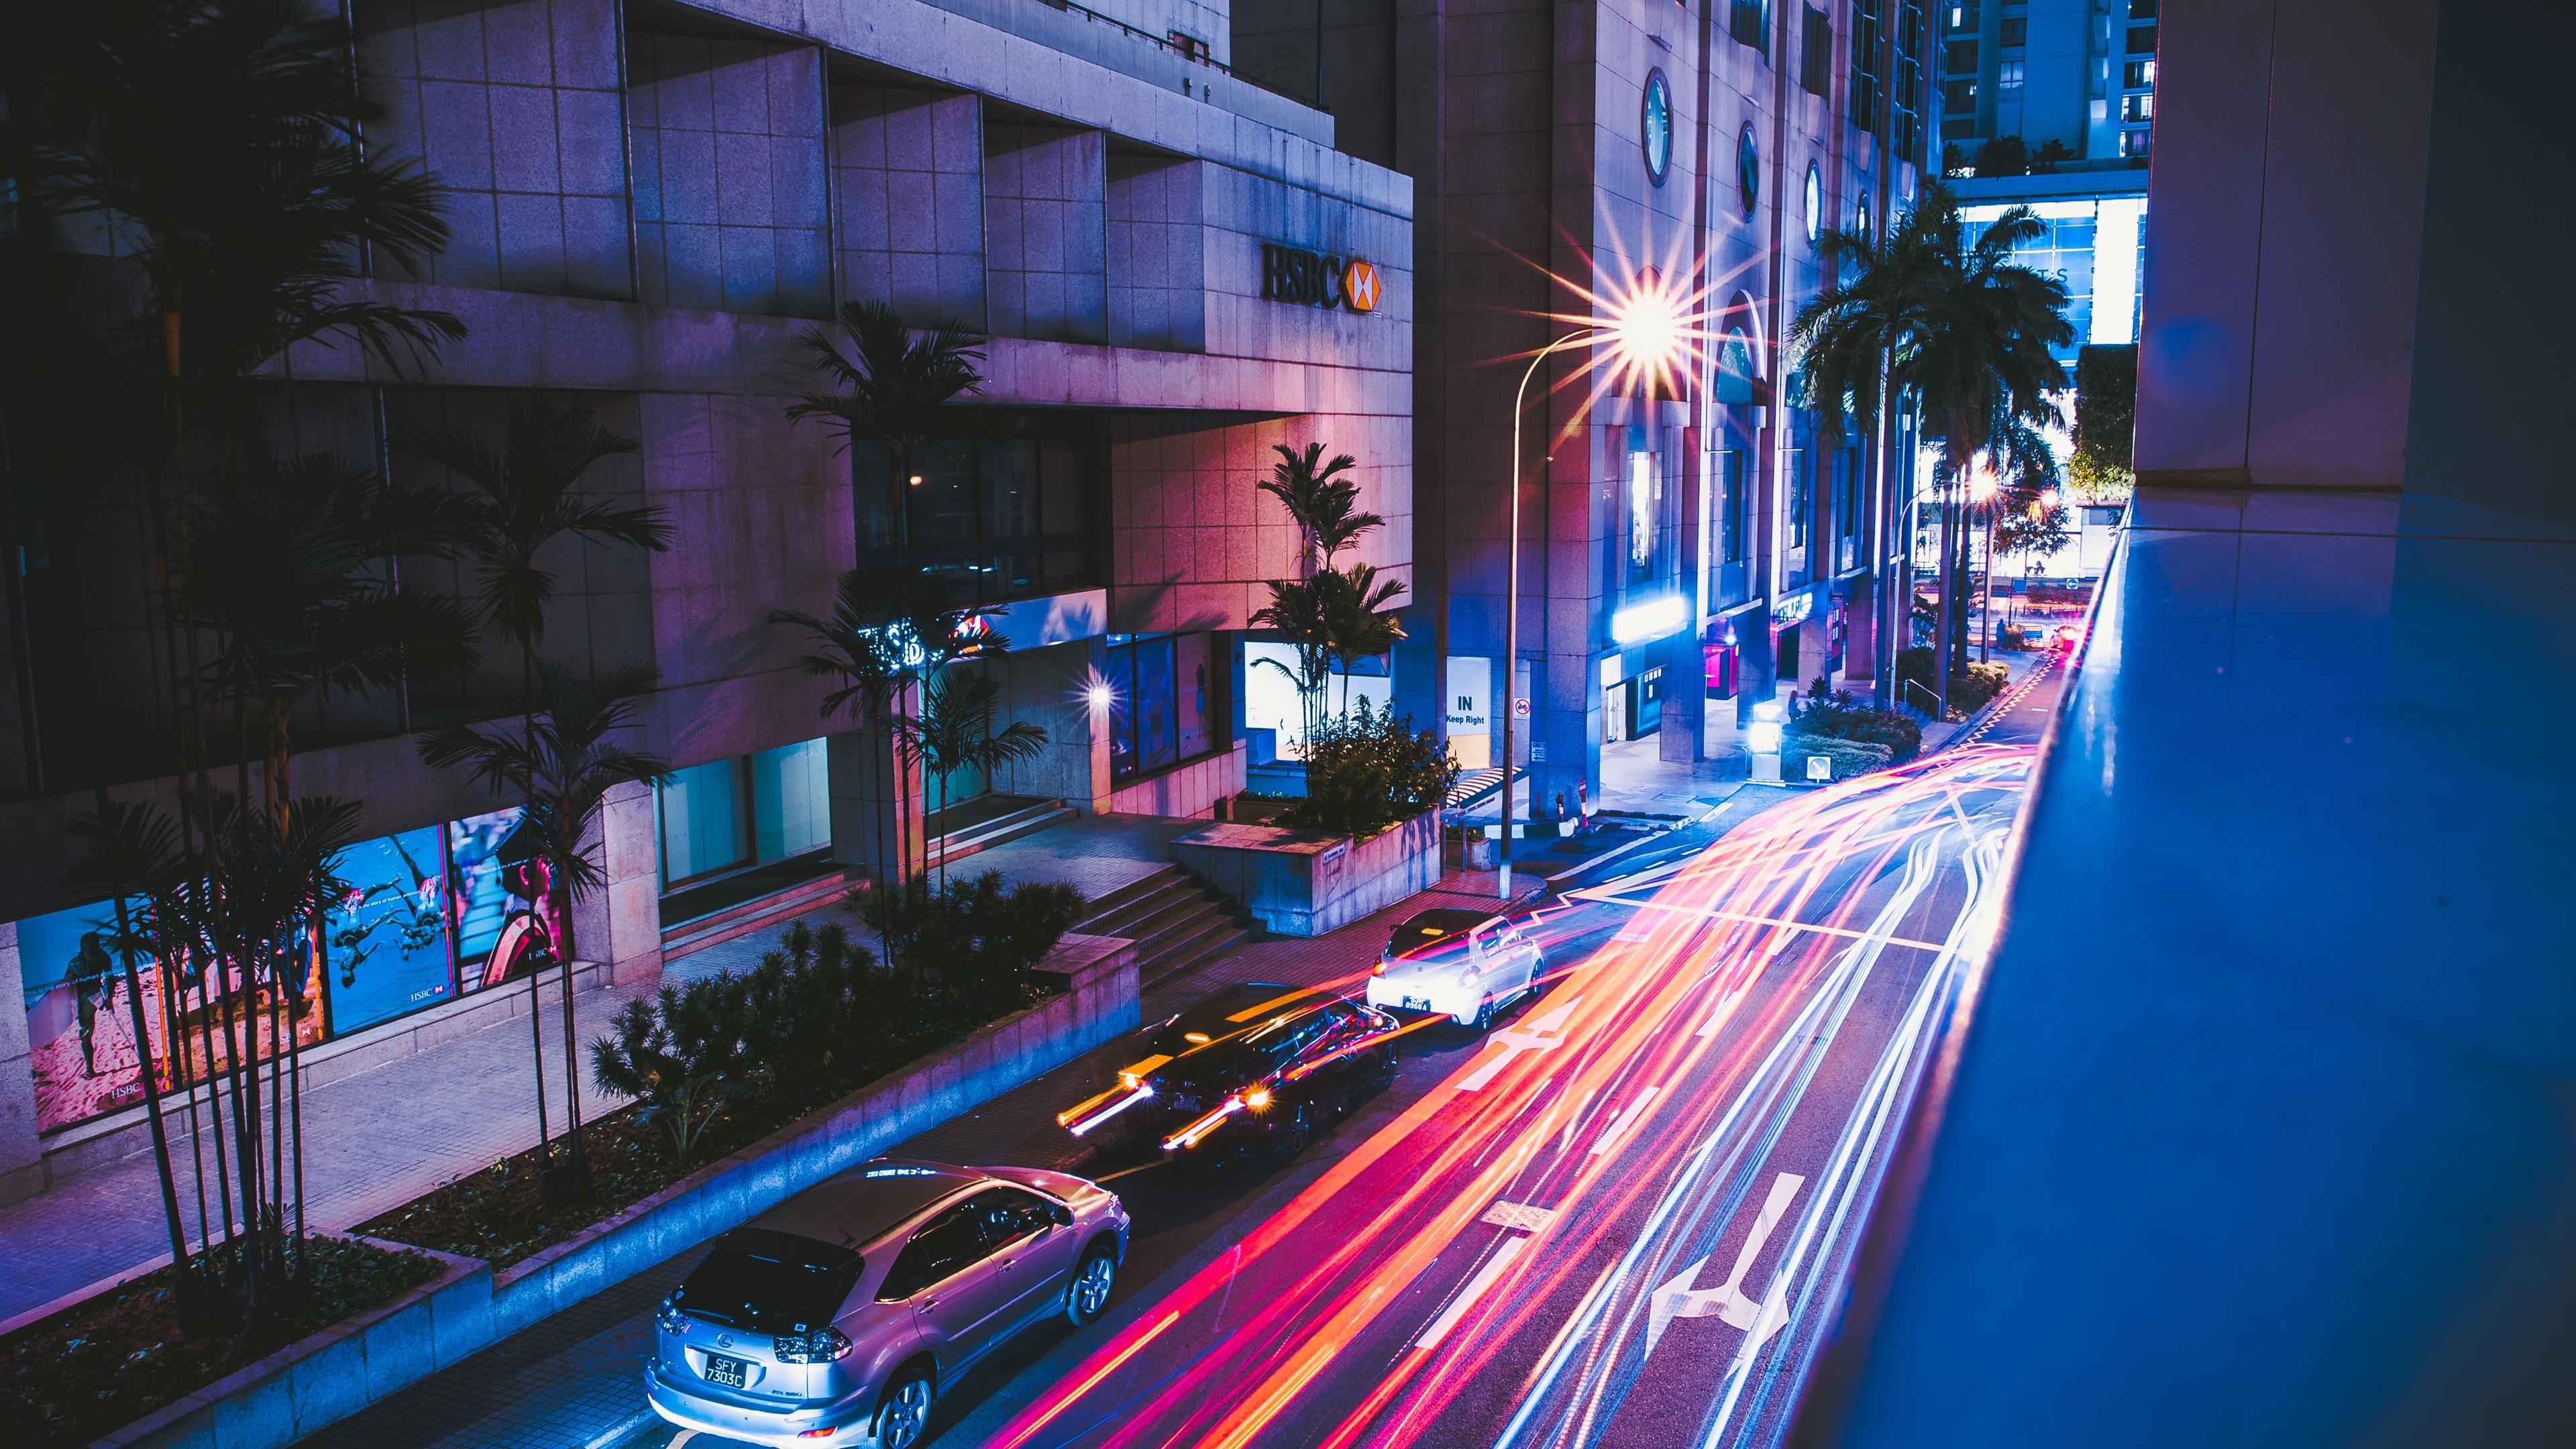 Wallpaper Night Road Street Cars Light City 3840x2160